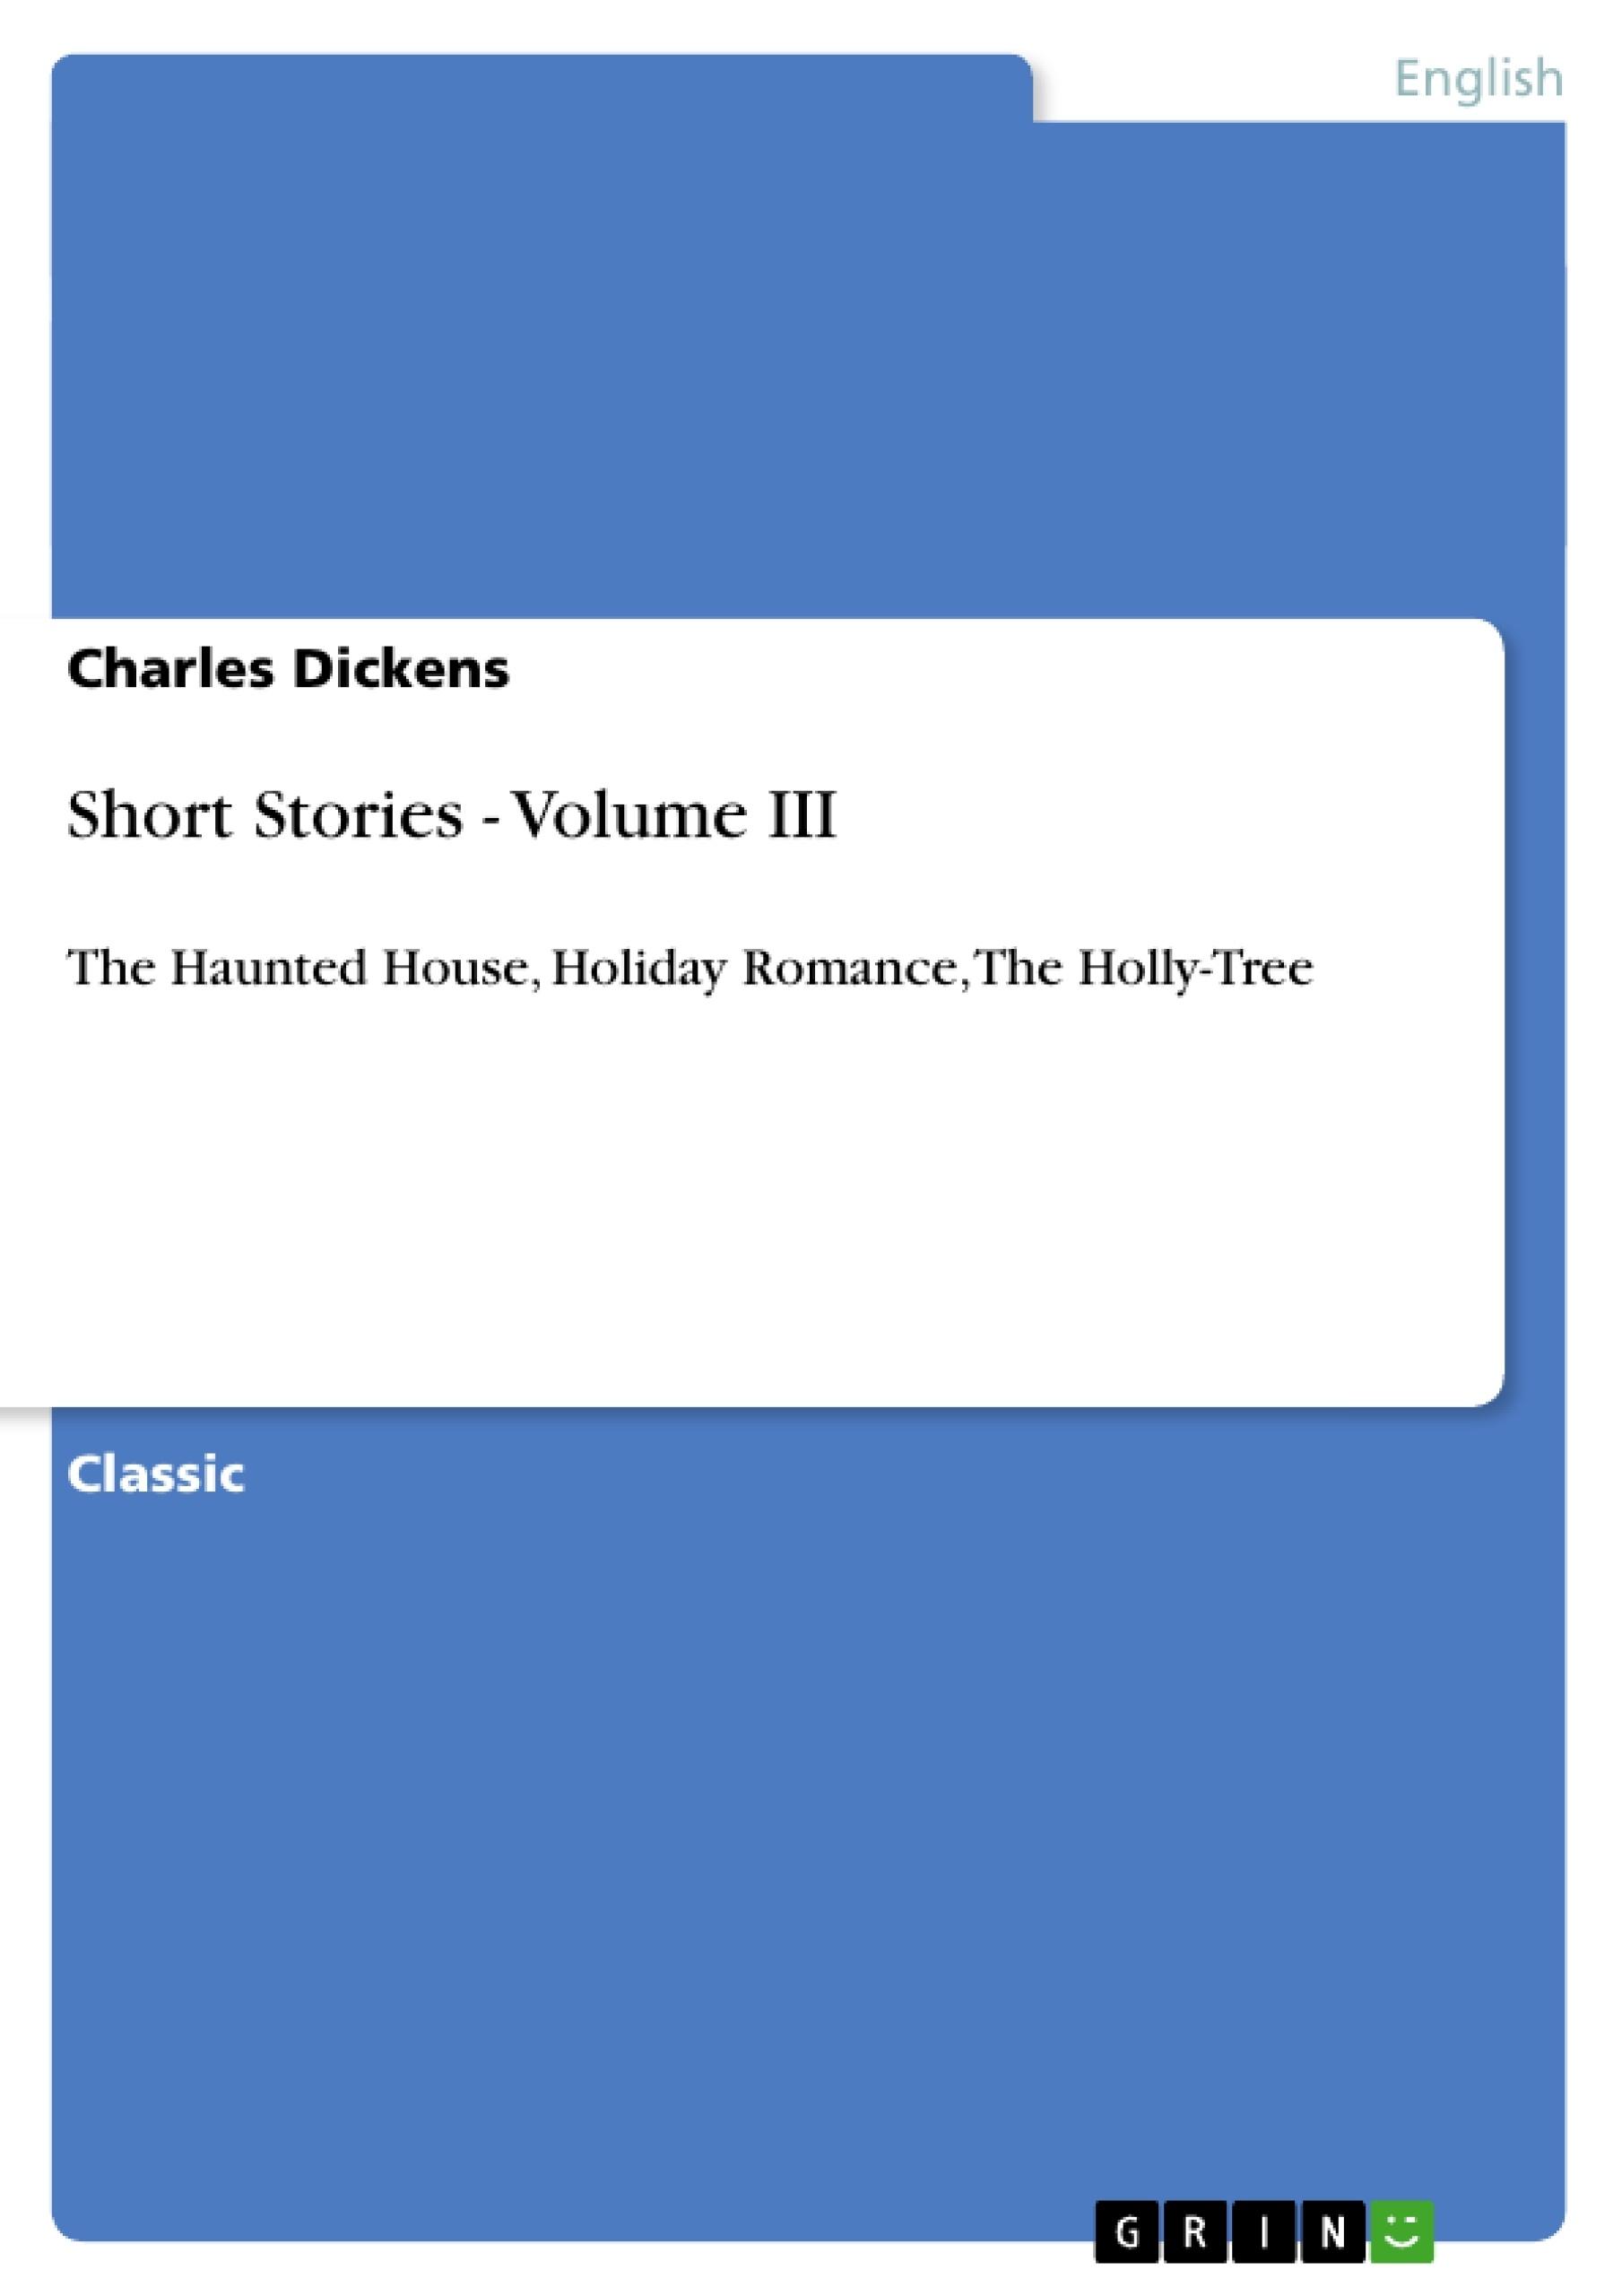 Title: Short Stories - Volume III